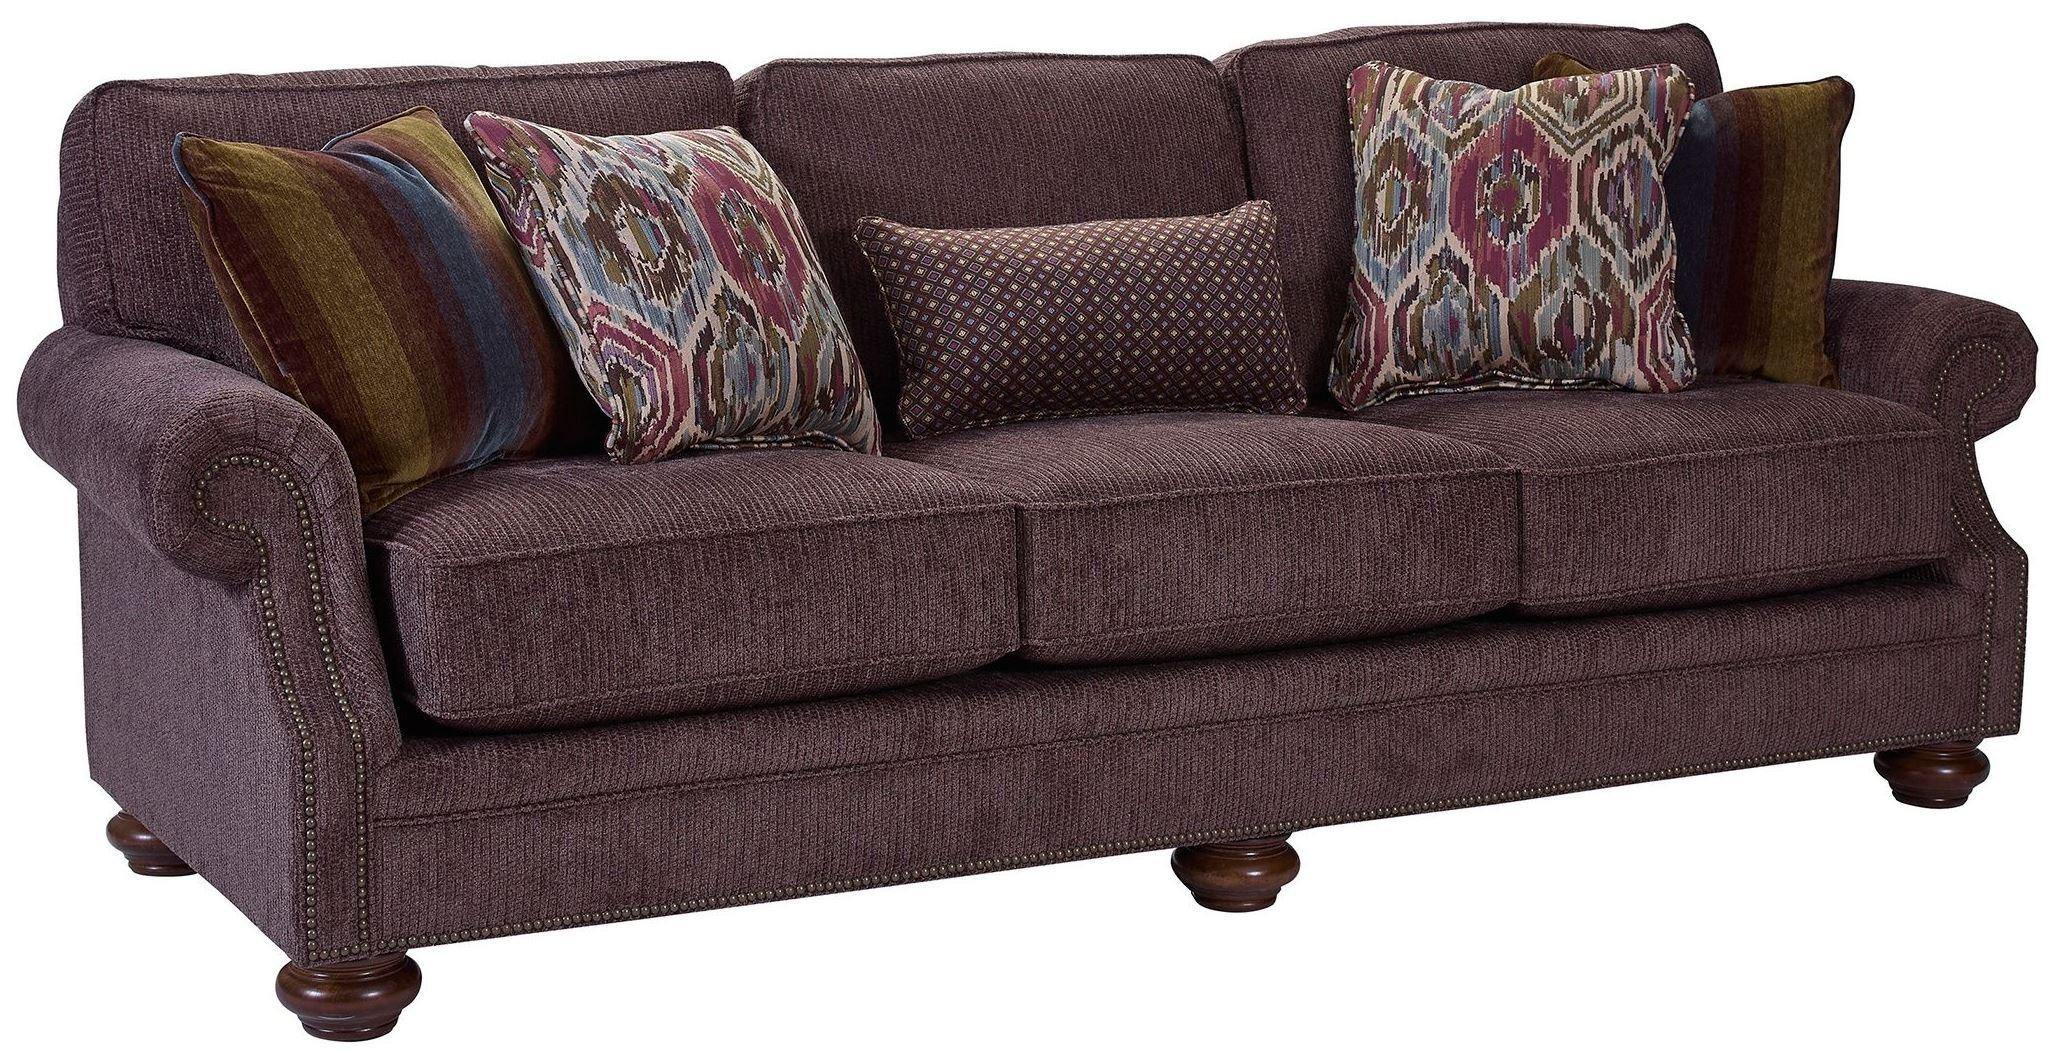 Heuer Walnut Chenille Fabric Sofa from Broyhill | Coleman ...